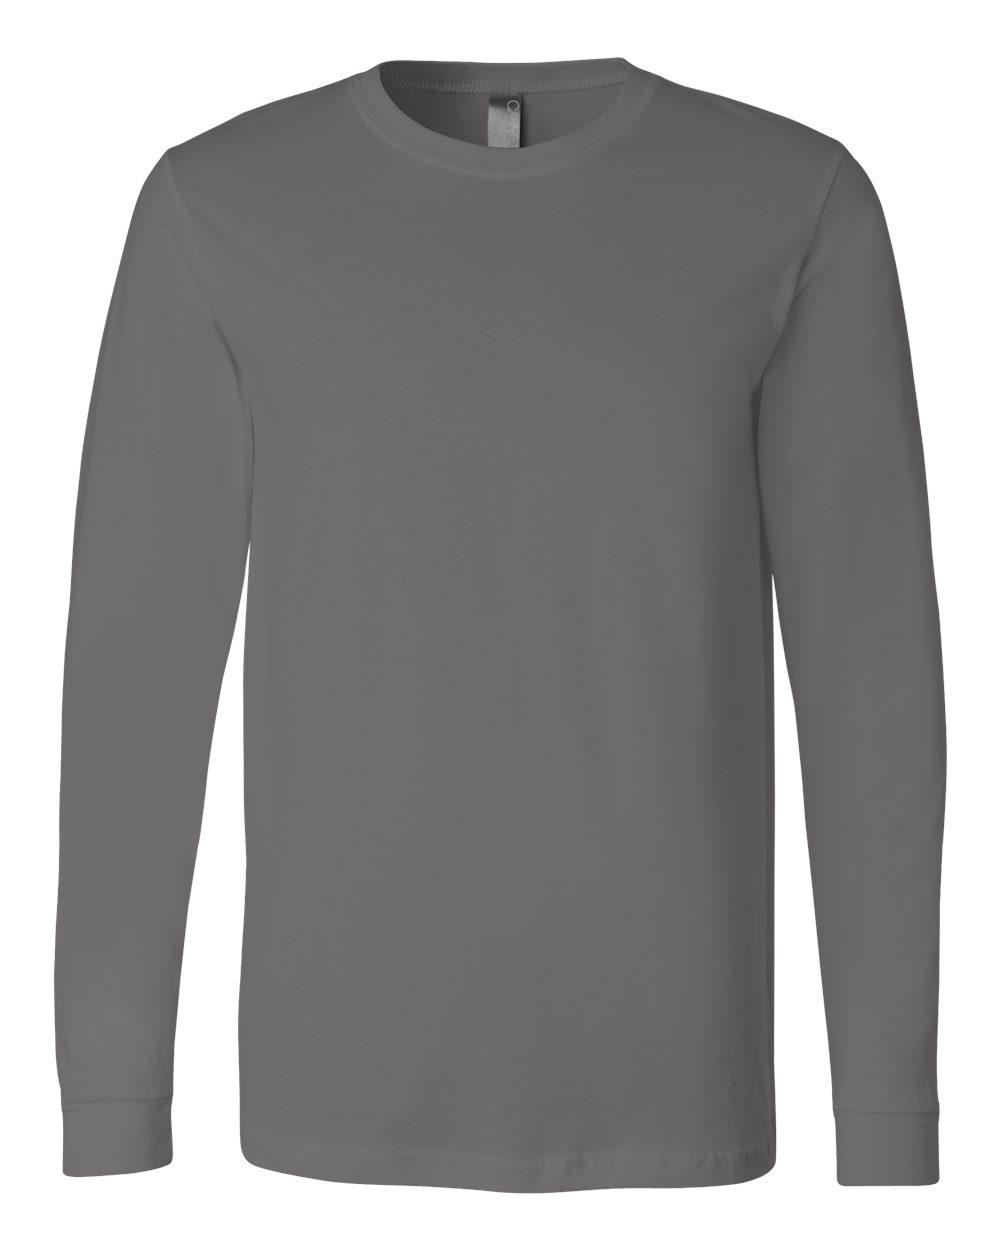 Bella-Canvas-Mens-Blank-Top-Long-Sleeve-Jersey-Tee-T-Shirt-3501-up-to-3XL thumbnail 9